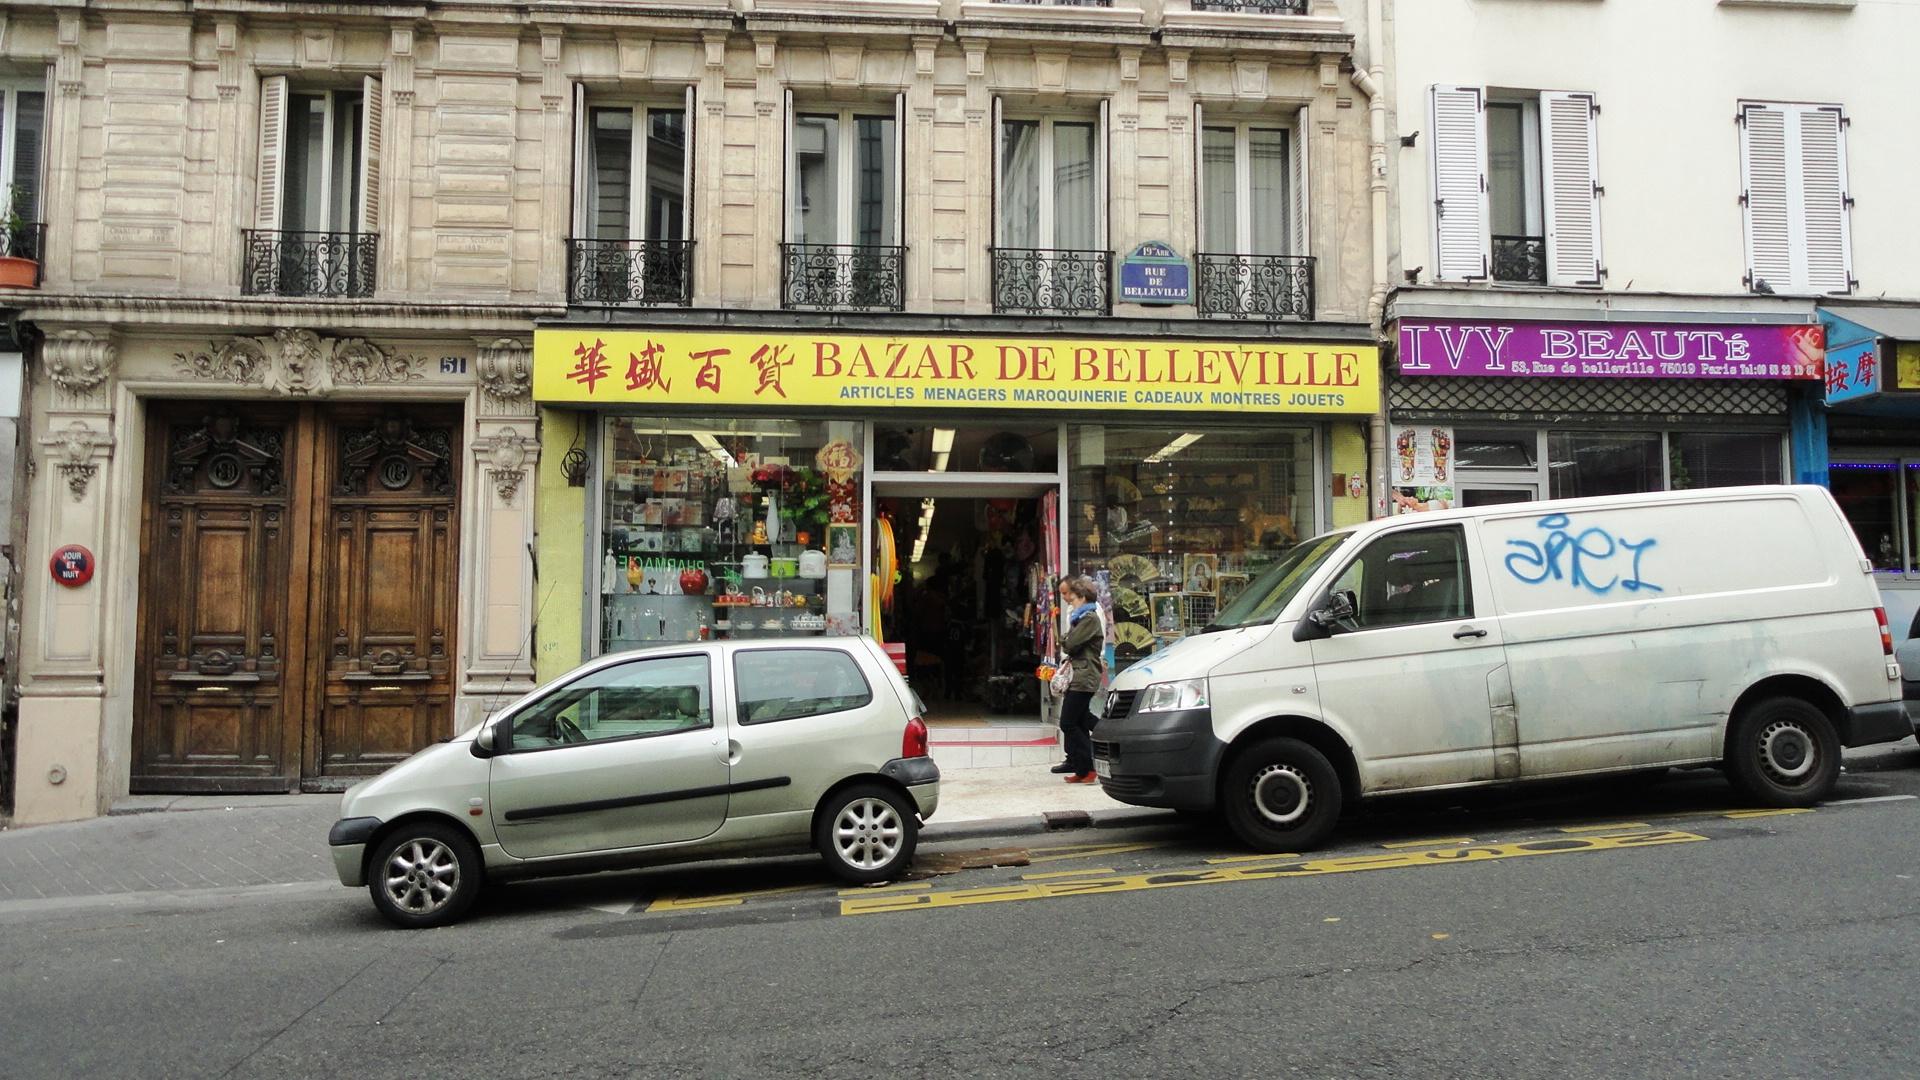 L'Asie rue de Belleville - Devantures